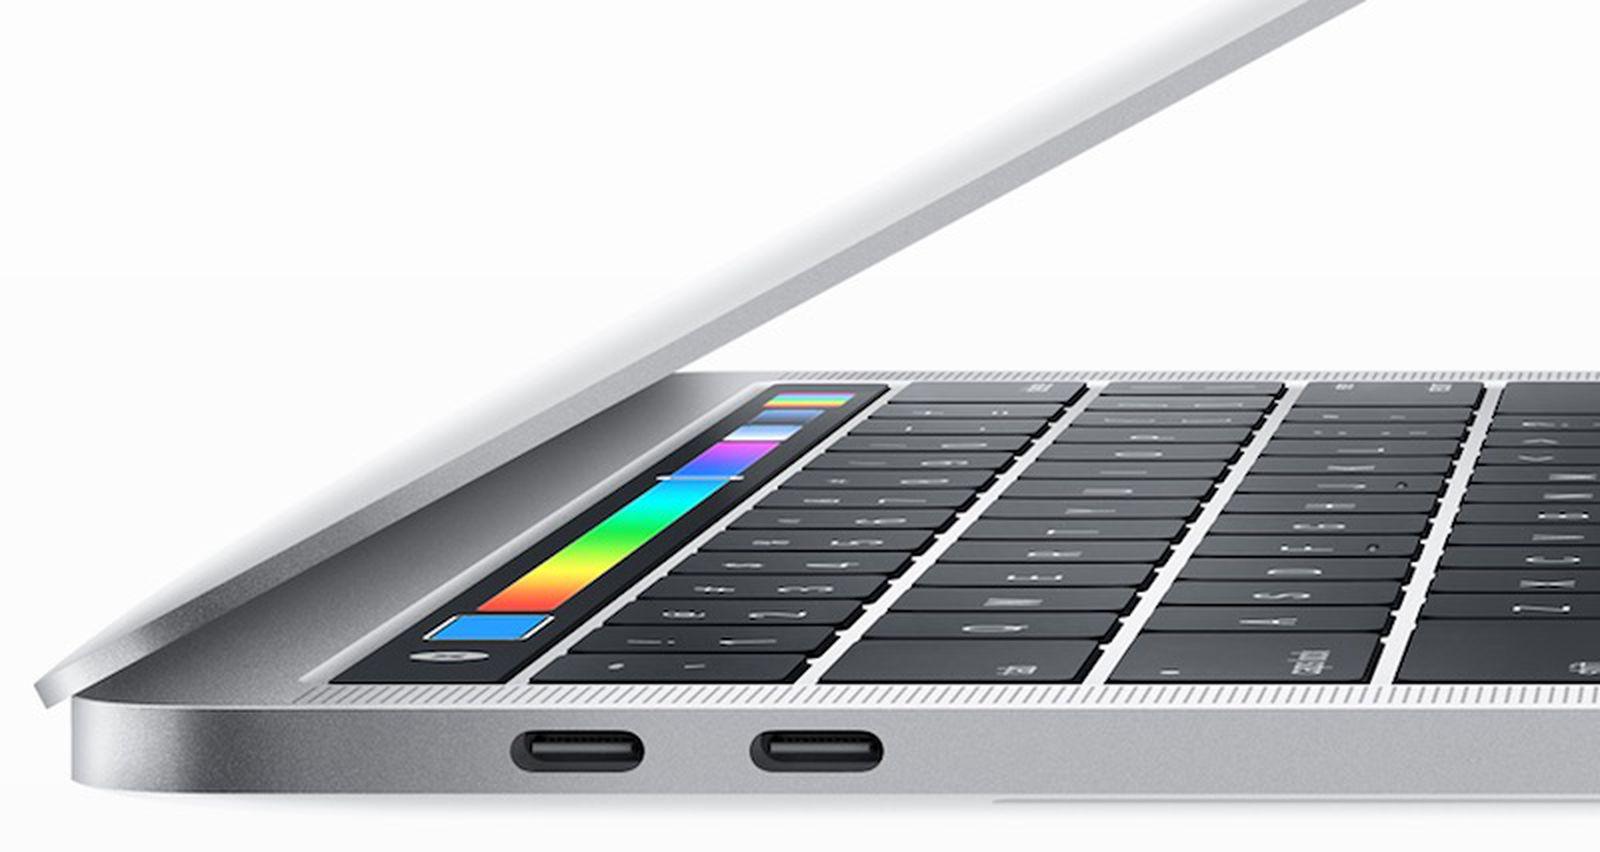 apple-silicon-intel-thunderbolt-arm-macs-support-usb-c